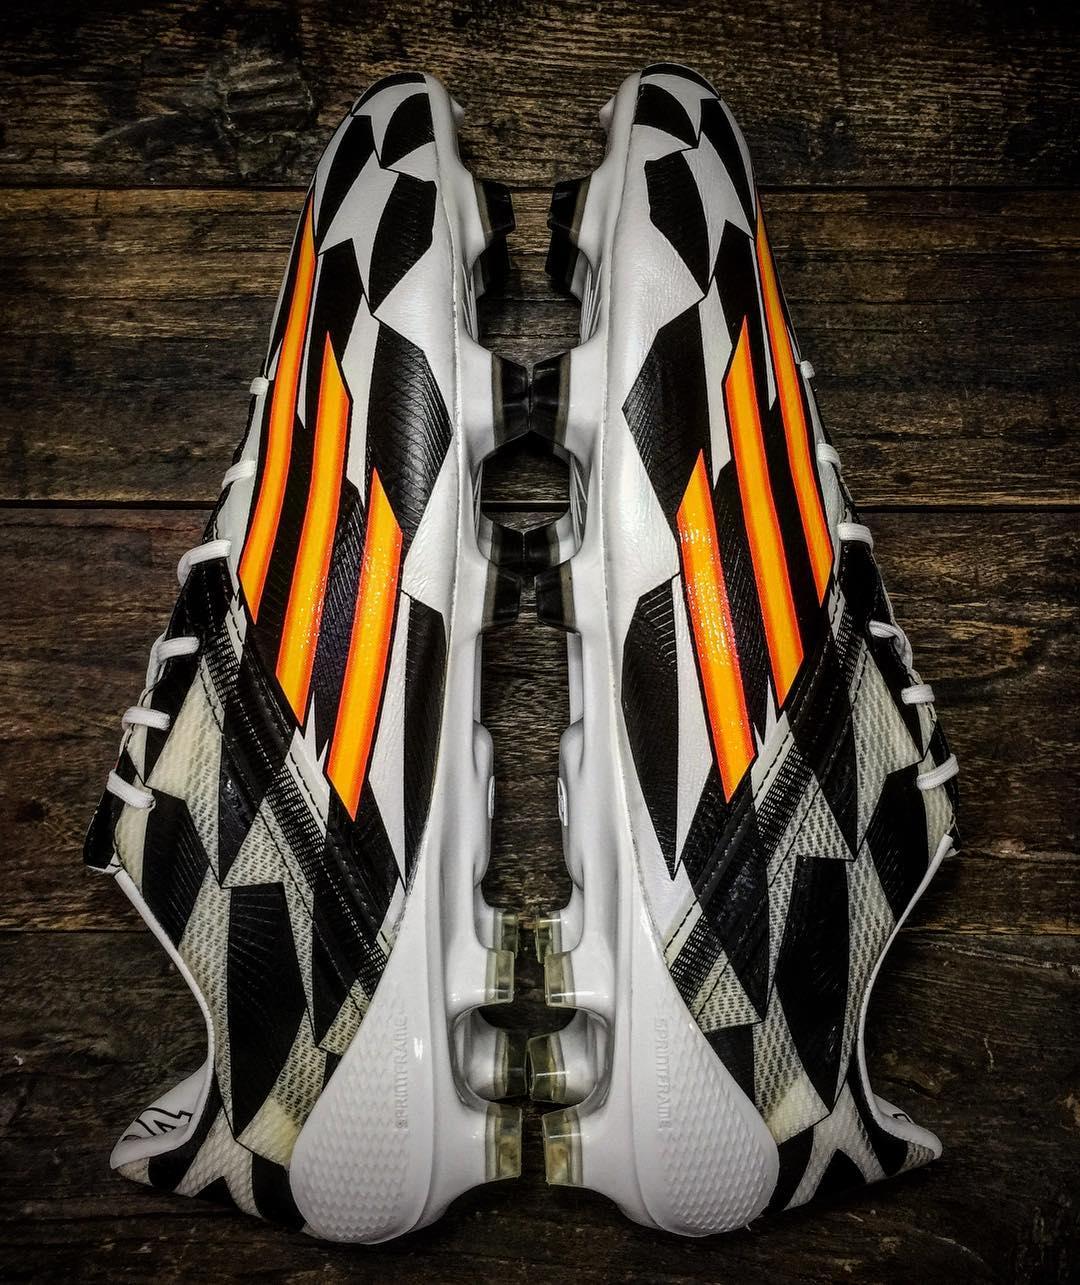 collection-chaussures-de-foot-joueurs-5